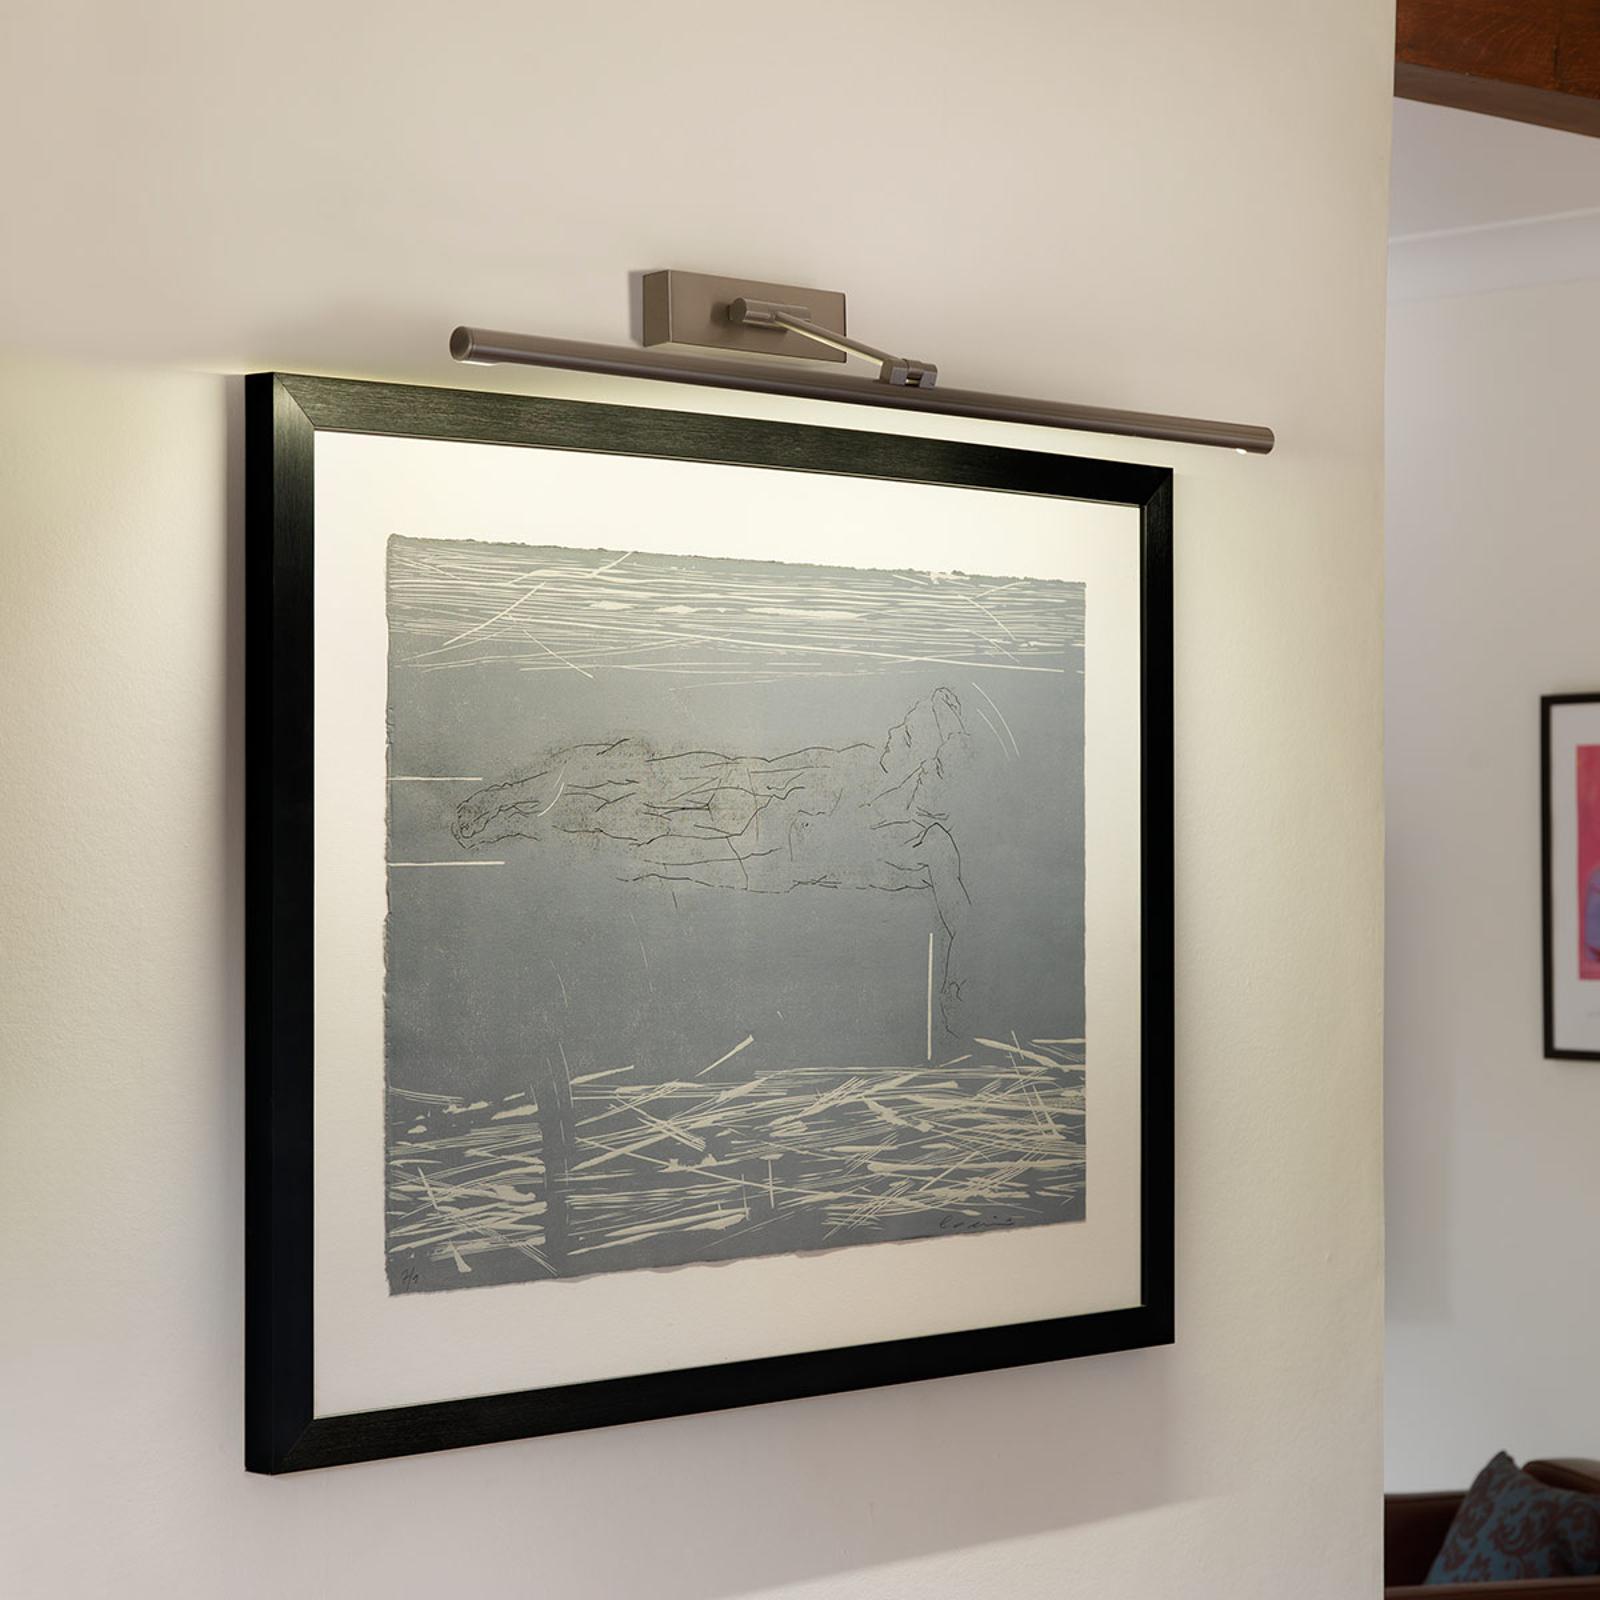 Astro Goya 760 - LED-Bilderleuchte, nickel